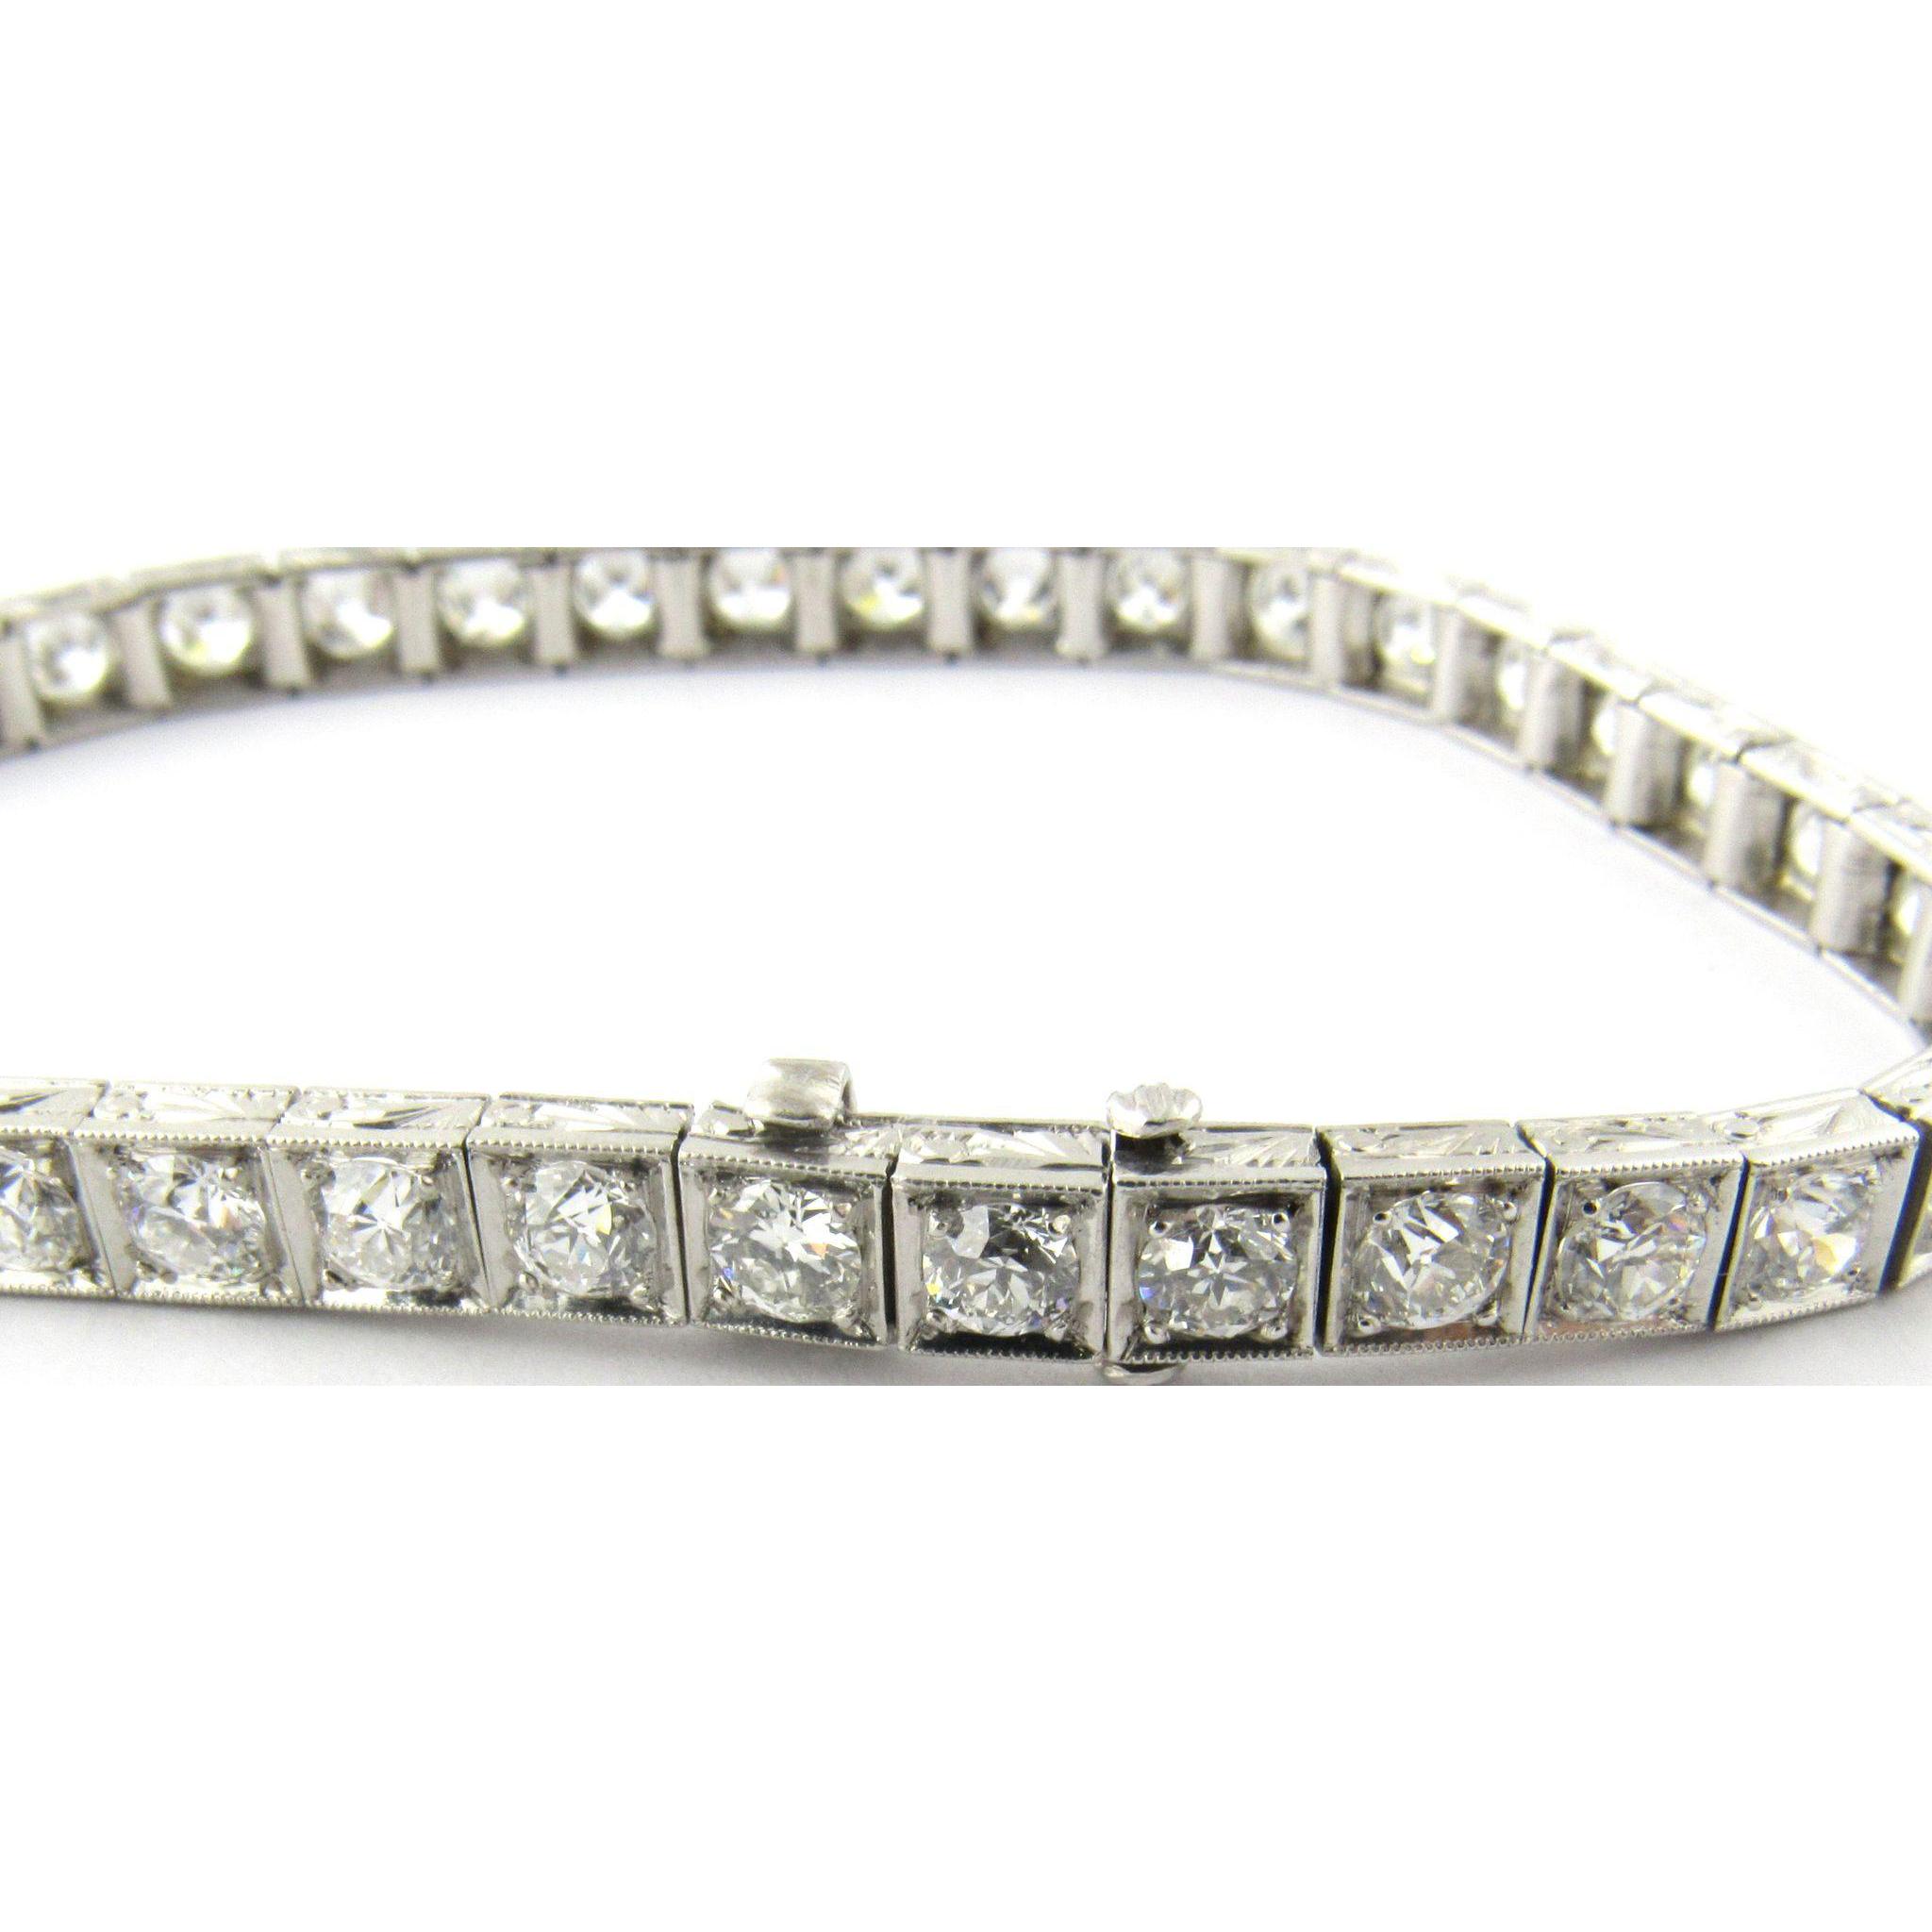 Vintage Platinum European Cut Diamond Tennis Bracelet 6 Carats Gold And Silver Brokers Ruby Lane